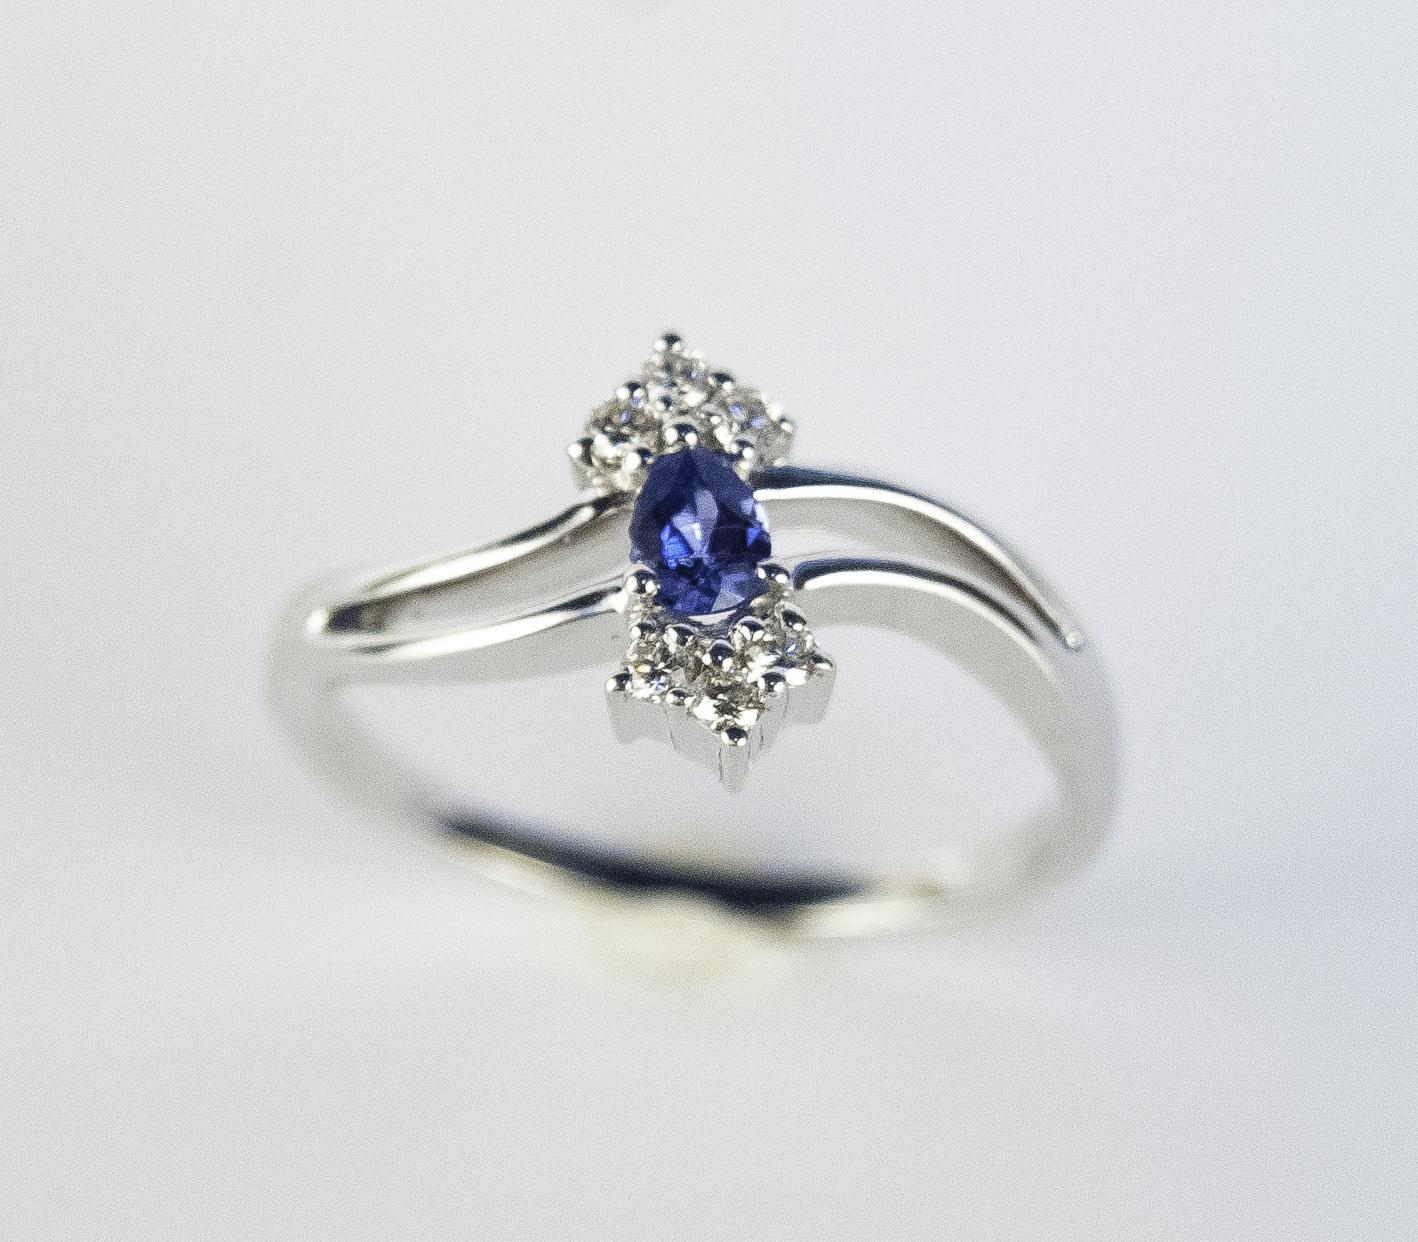 200-899   14 Karat White Gold Fashion Ring Size 7 With One 0.23Ct Marquise Yogo And 6=0.14Tw Round Diamonds $1,167.00